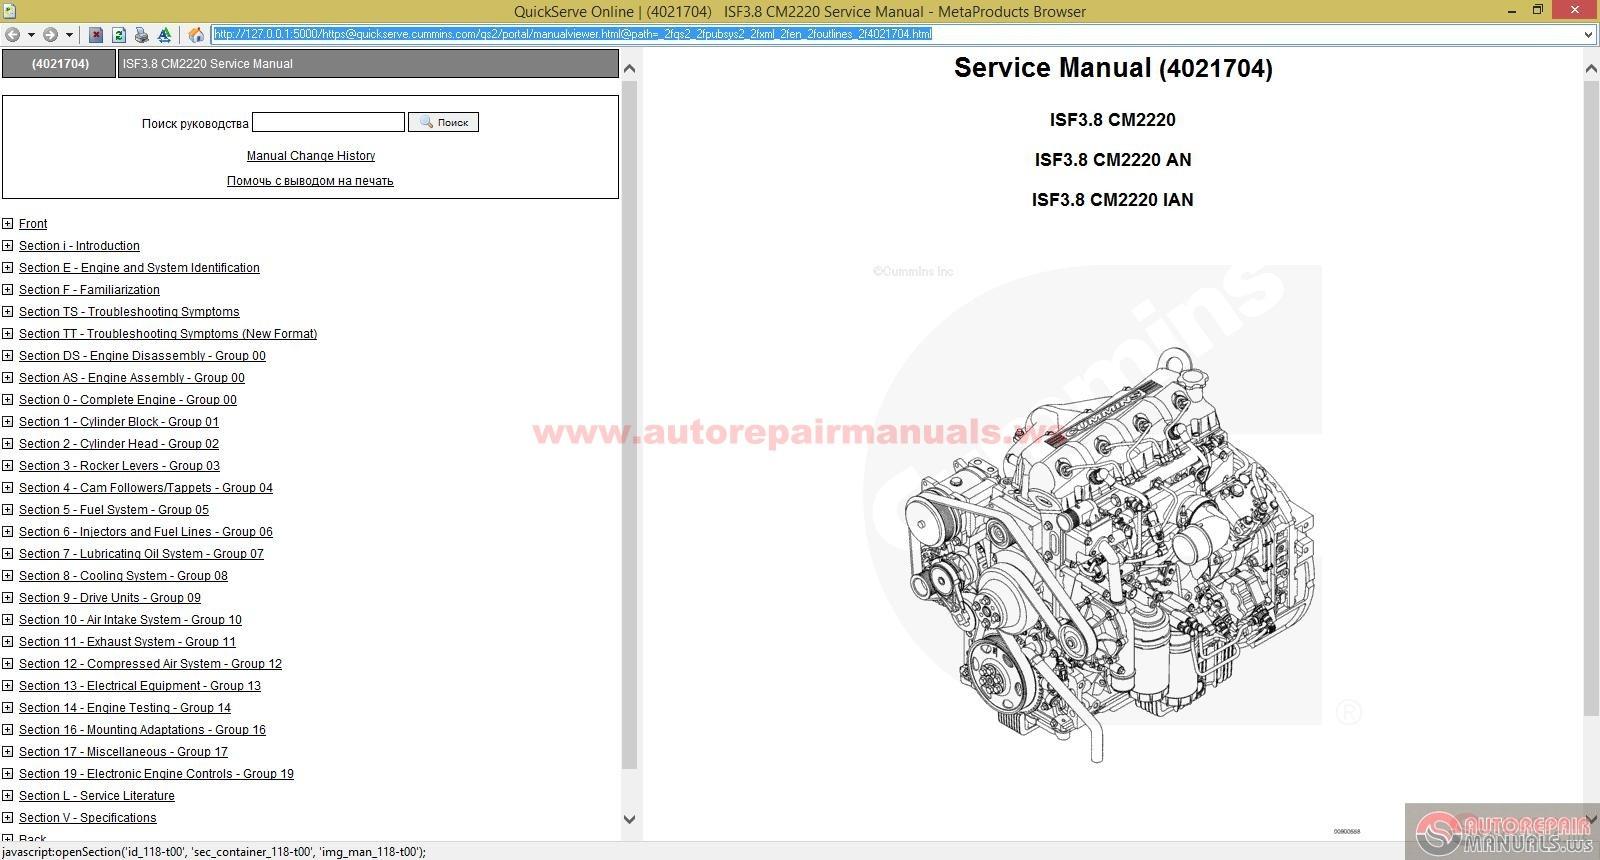 Cummins qsk60 engine manual